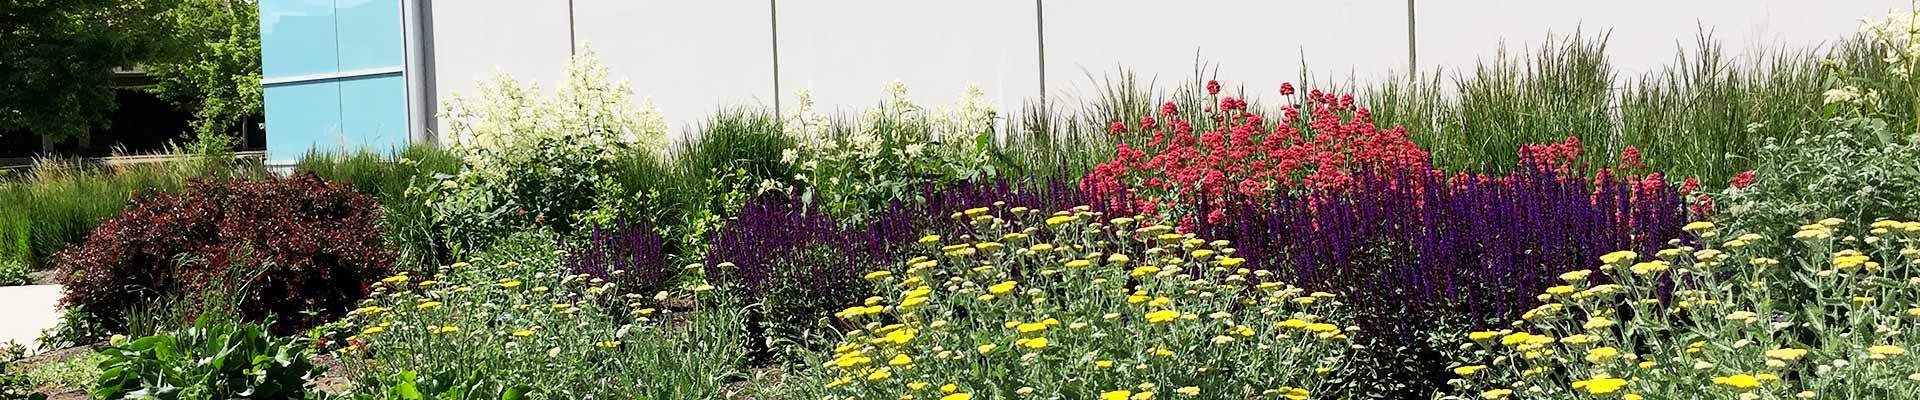 the Okanagan Xeriscape Association UNH20 Garden project June 2020